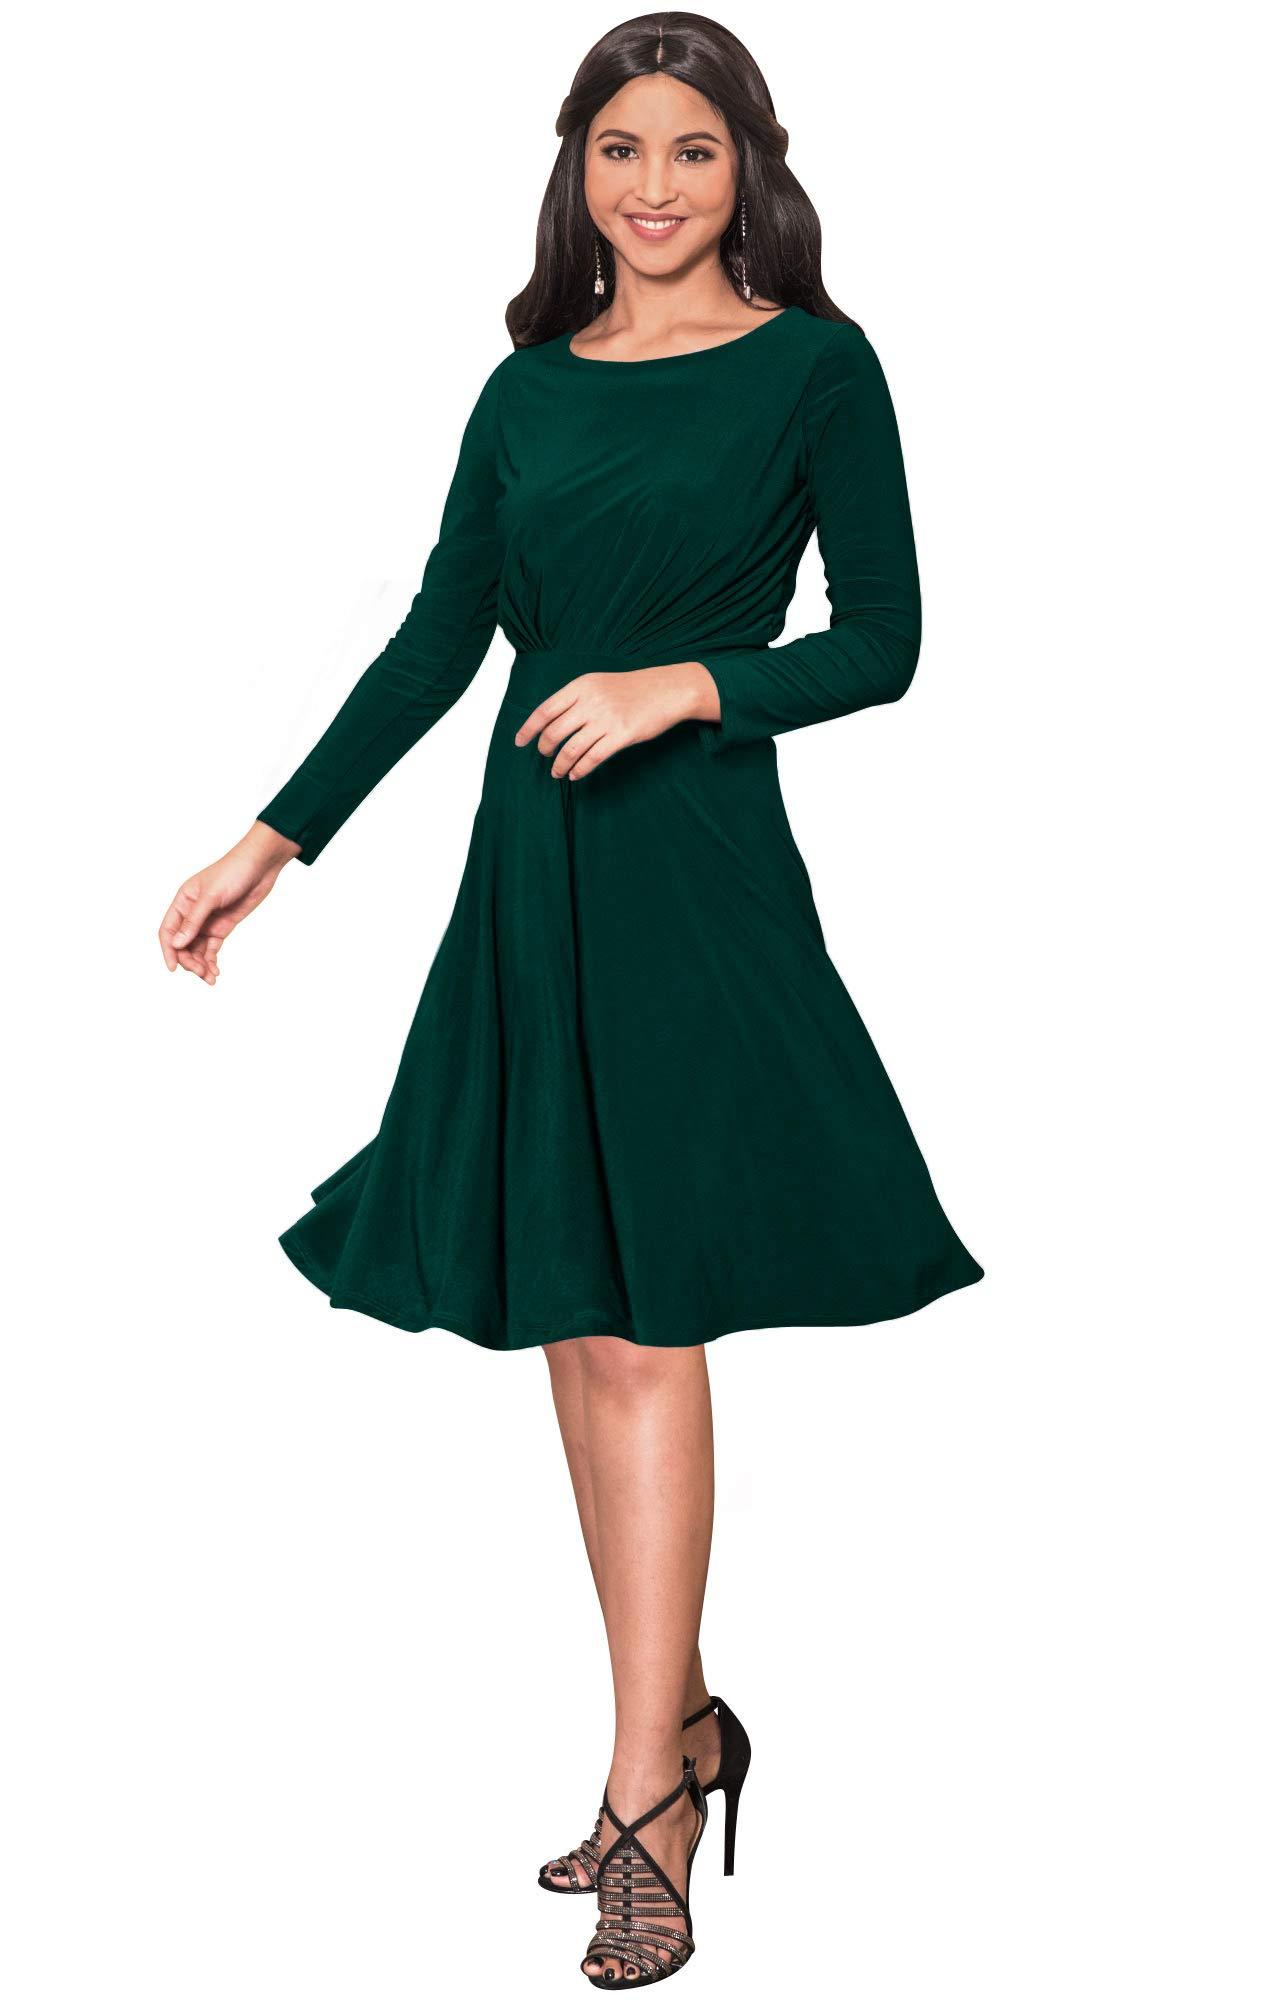 8664c48935 Long Sleeve Winter Ball Dresses - Gomes Weine AG